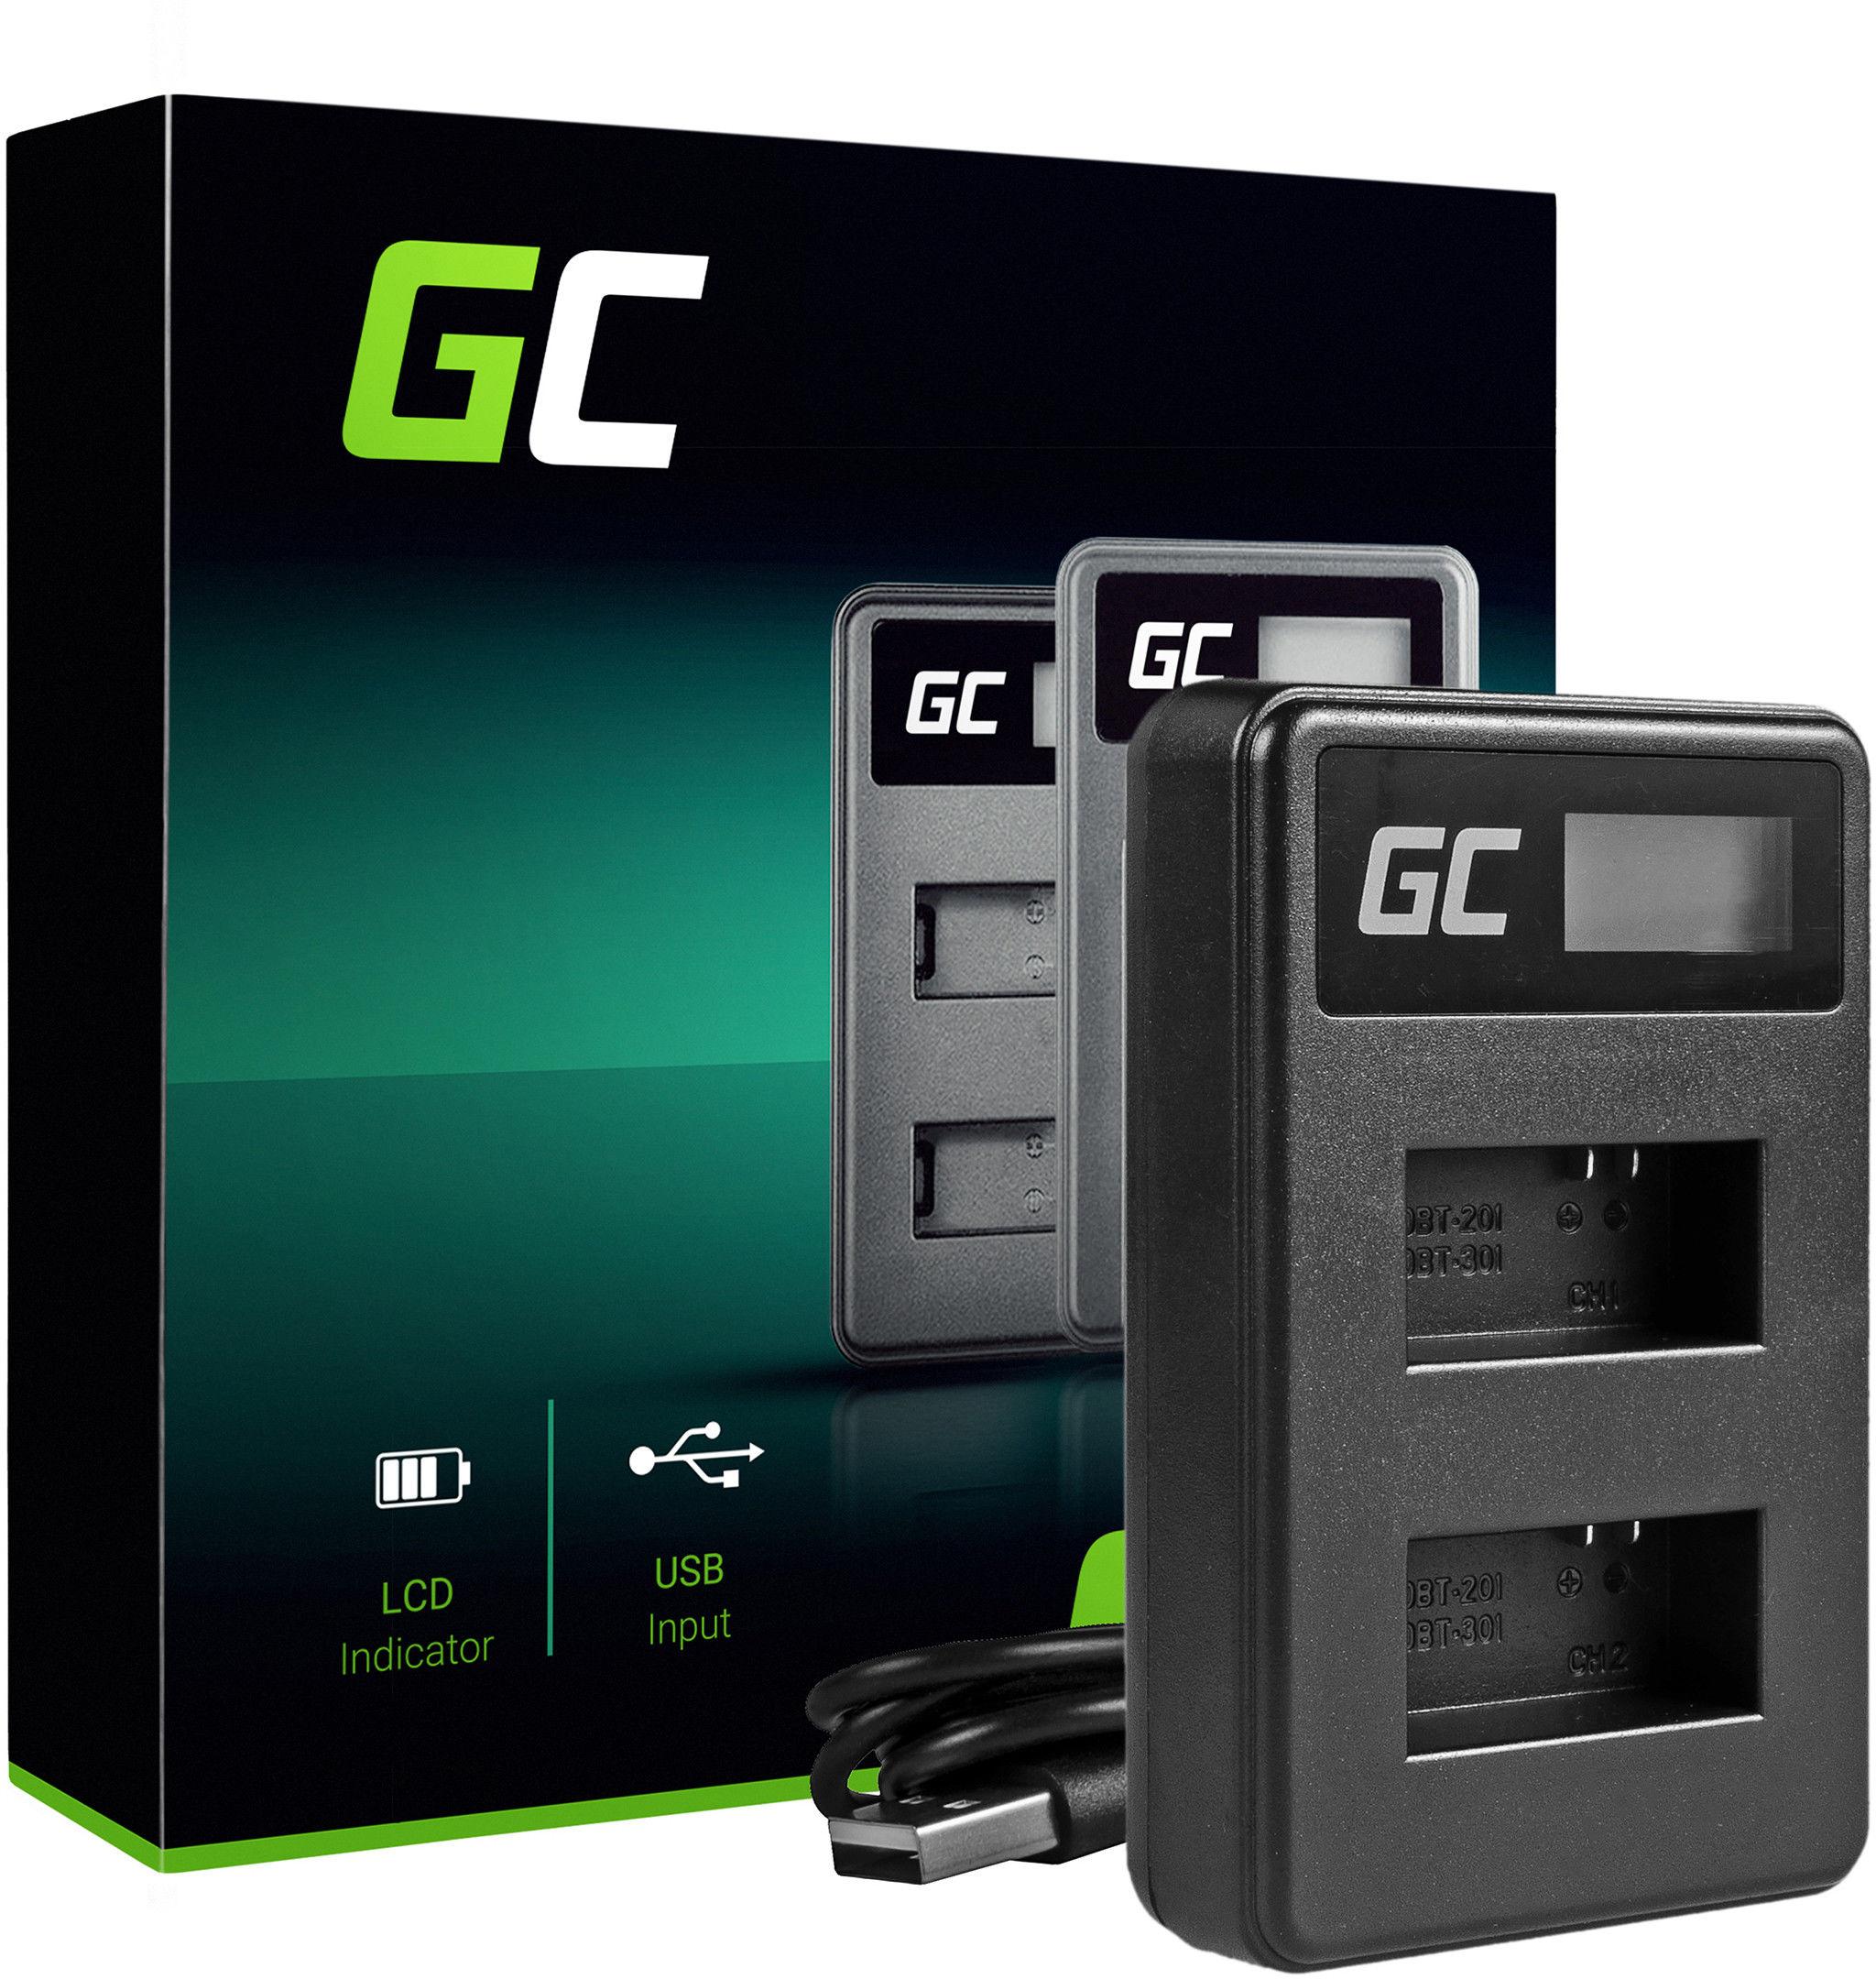 Ładowarka AHDBT-201 AHBBP-301 Green Cell  do GoPro HD HERO 3 CHDHX Black Silver White Edition (4.2V 2.5W 0.6A)